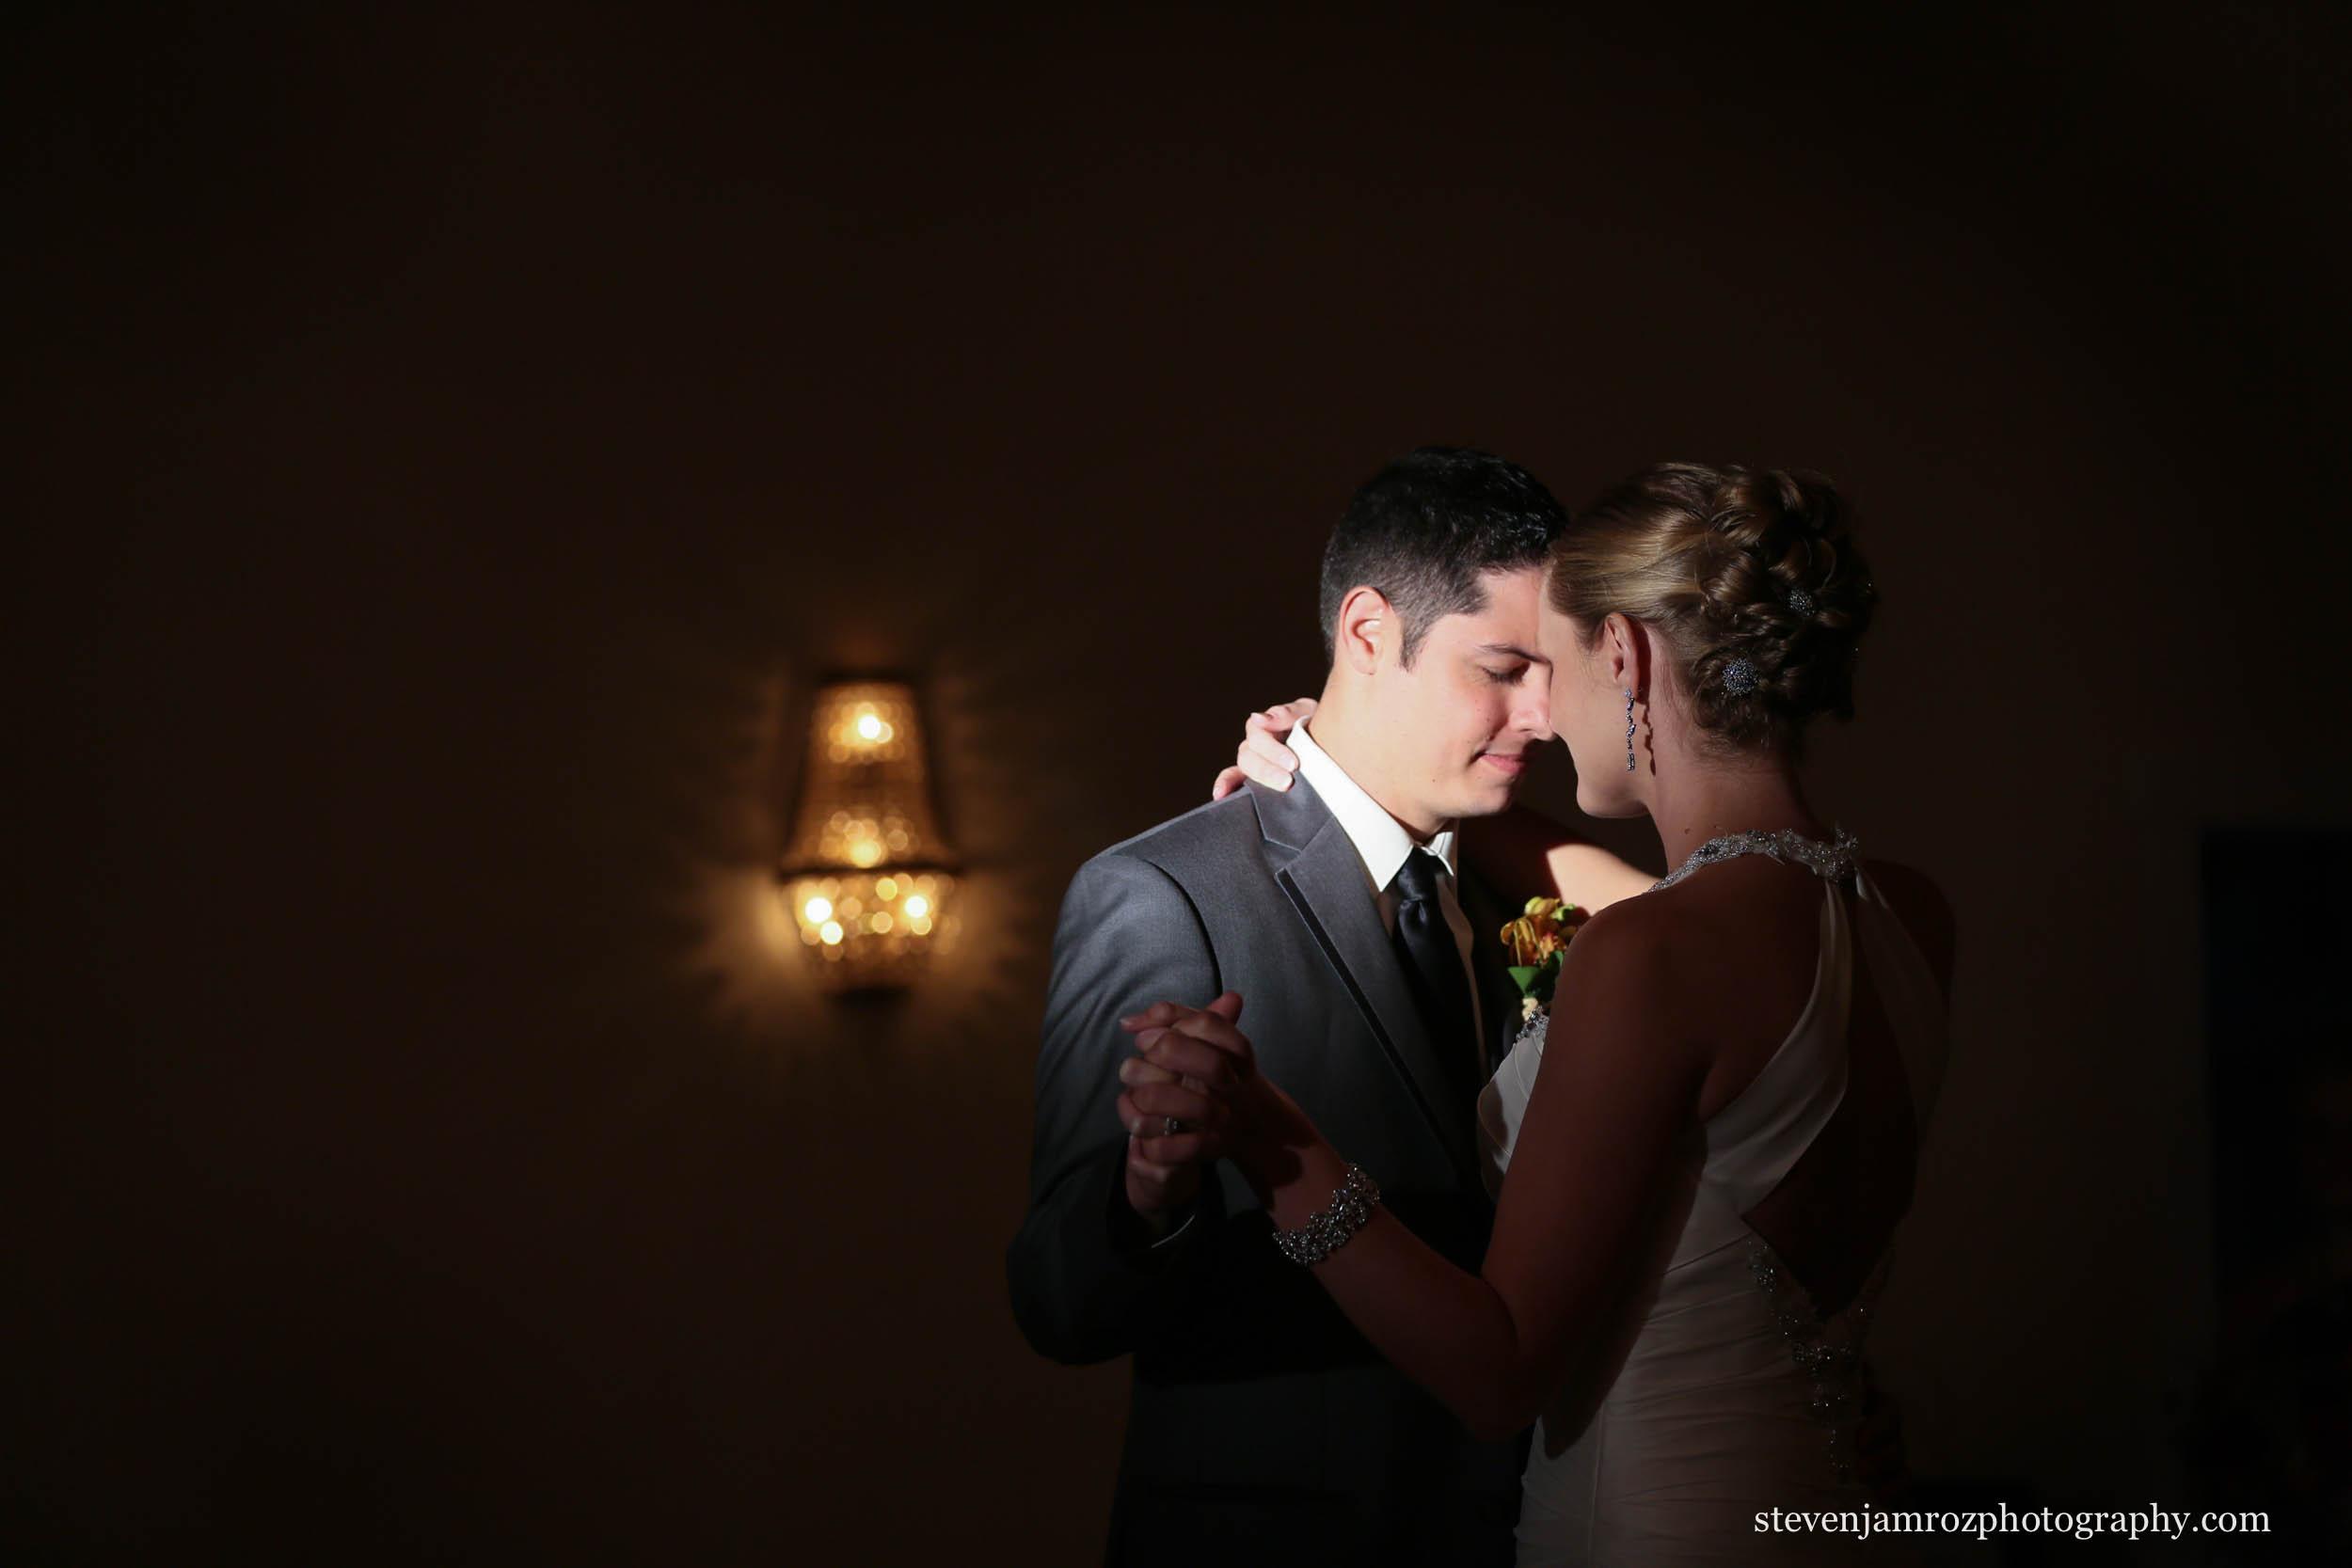 loving-first-dance-hudson-manor-louisburg-steven-jamroz-photography-0492.jpg